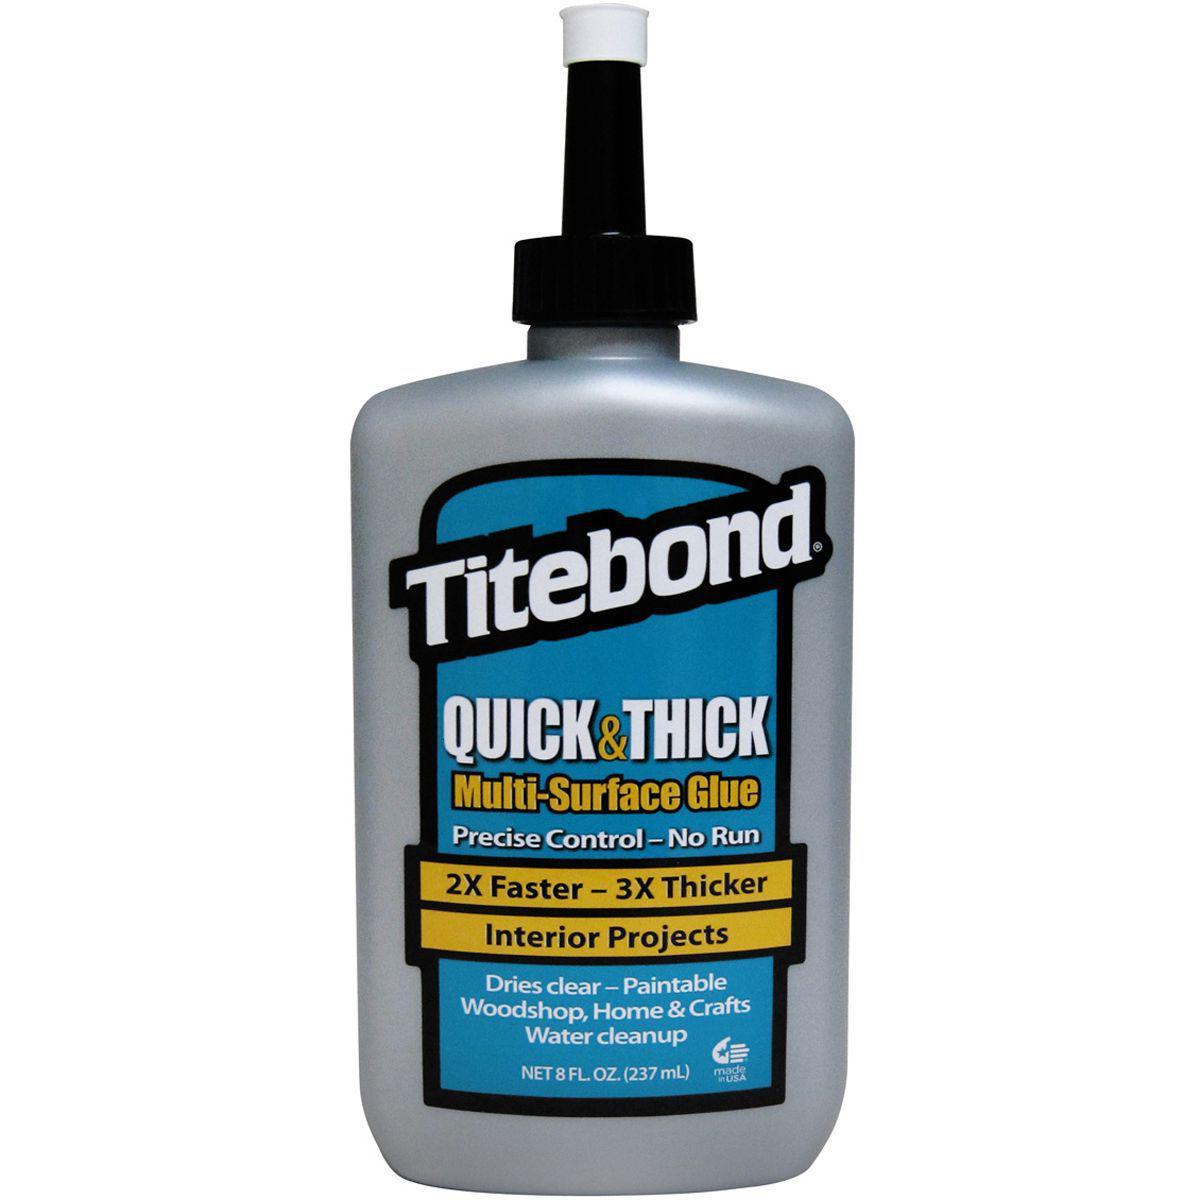 adesivo-quick-thick-titebond